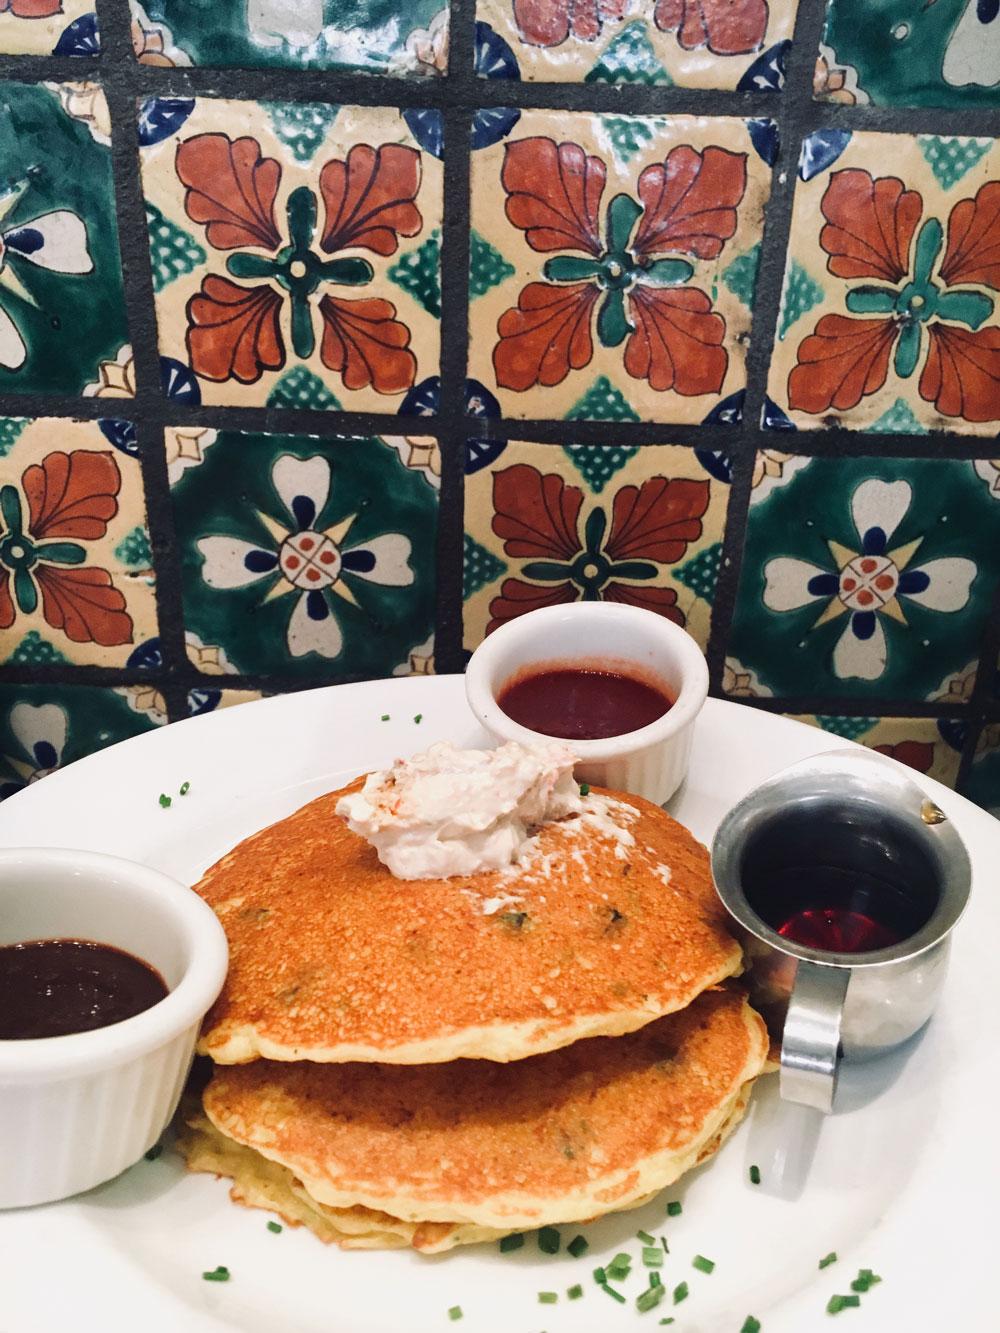 corncake at cafe pasqual's